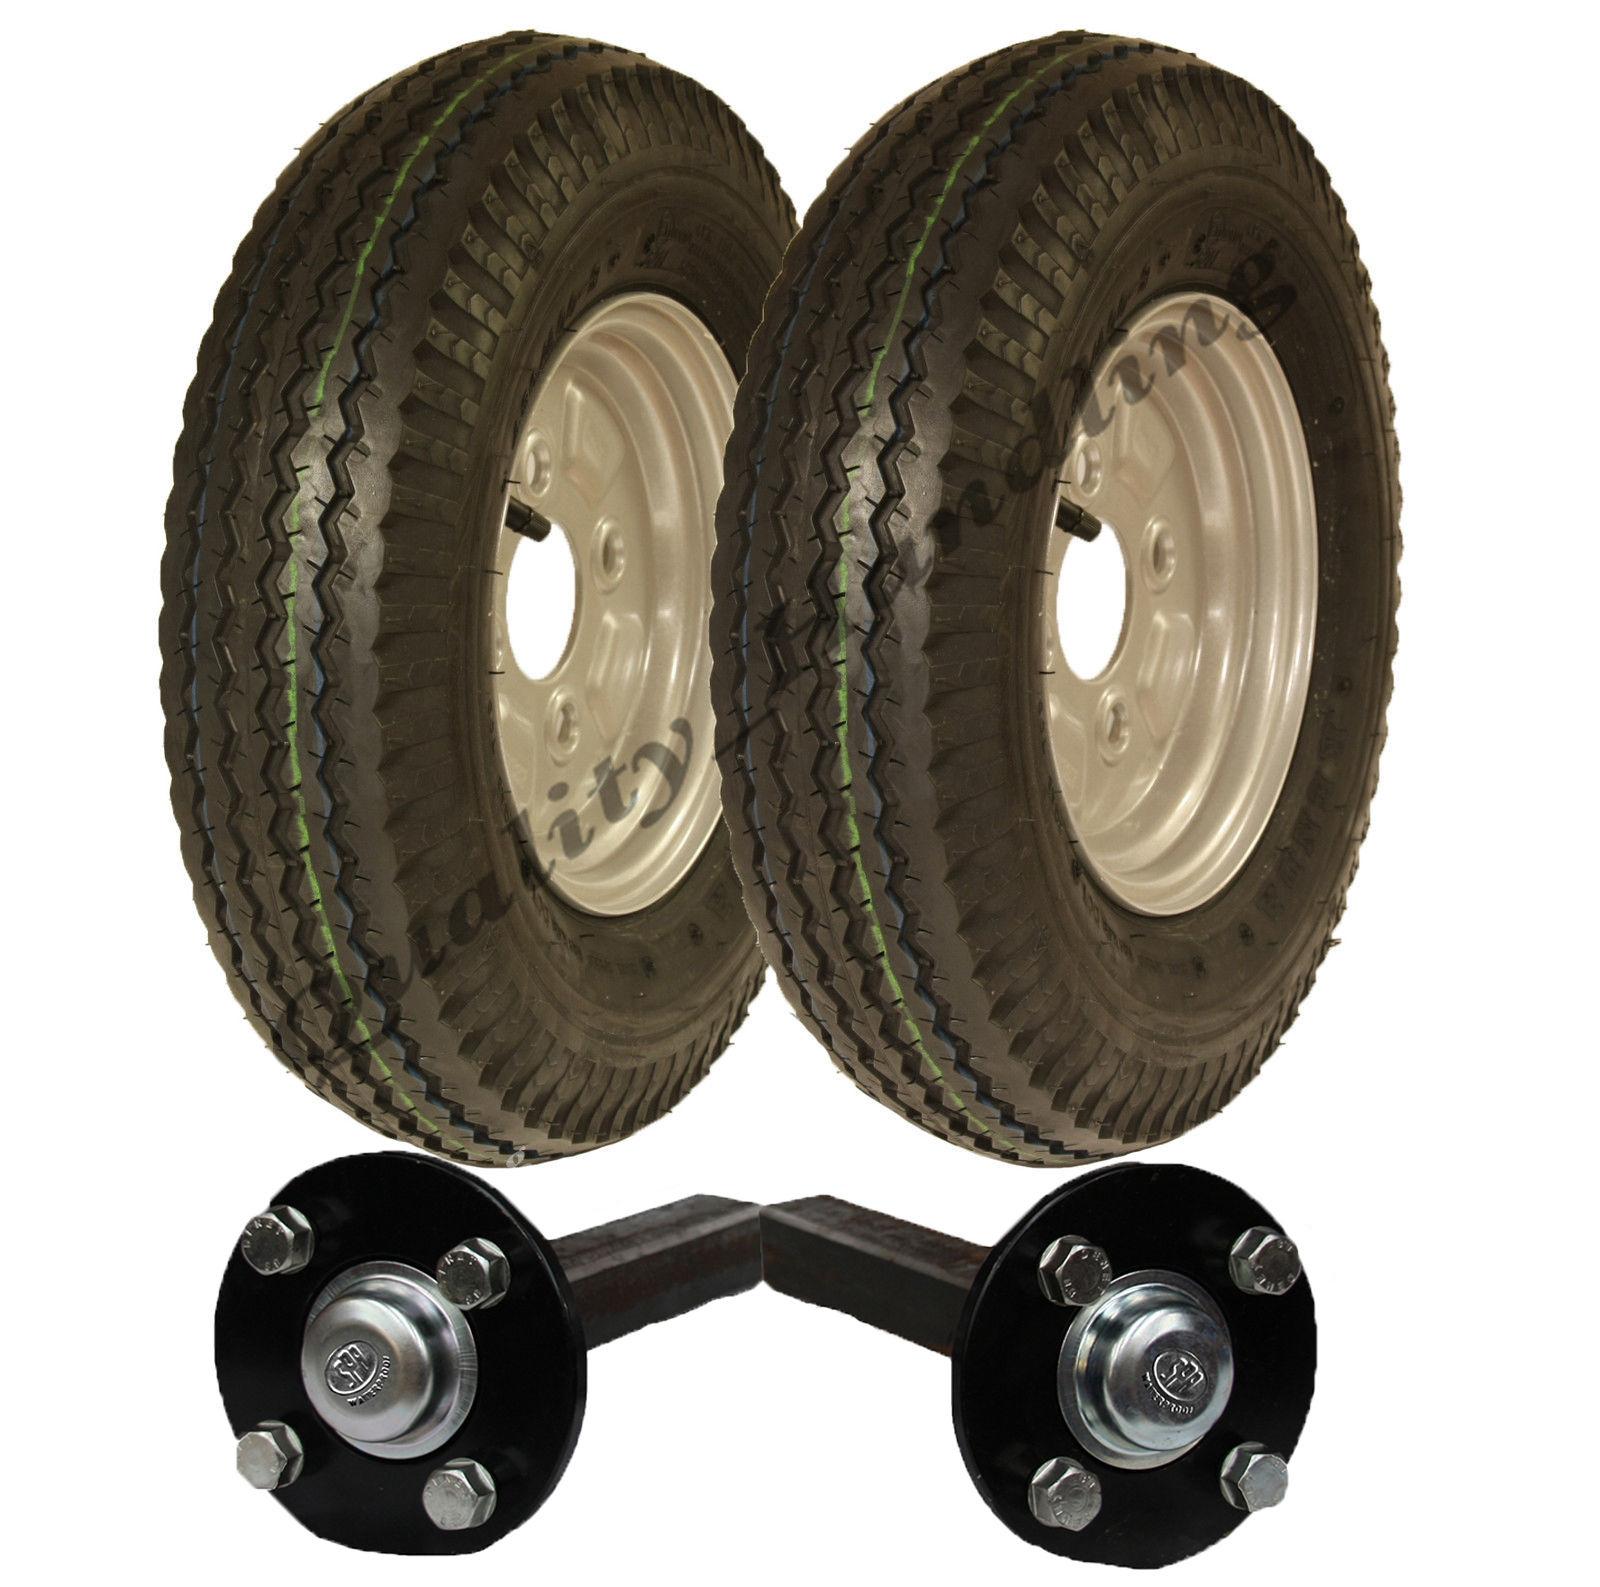 Wheel Axle Kits : High speed trailer kit road legal wheels hub